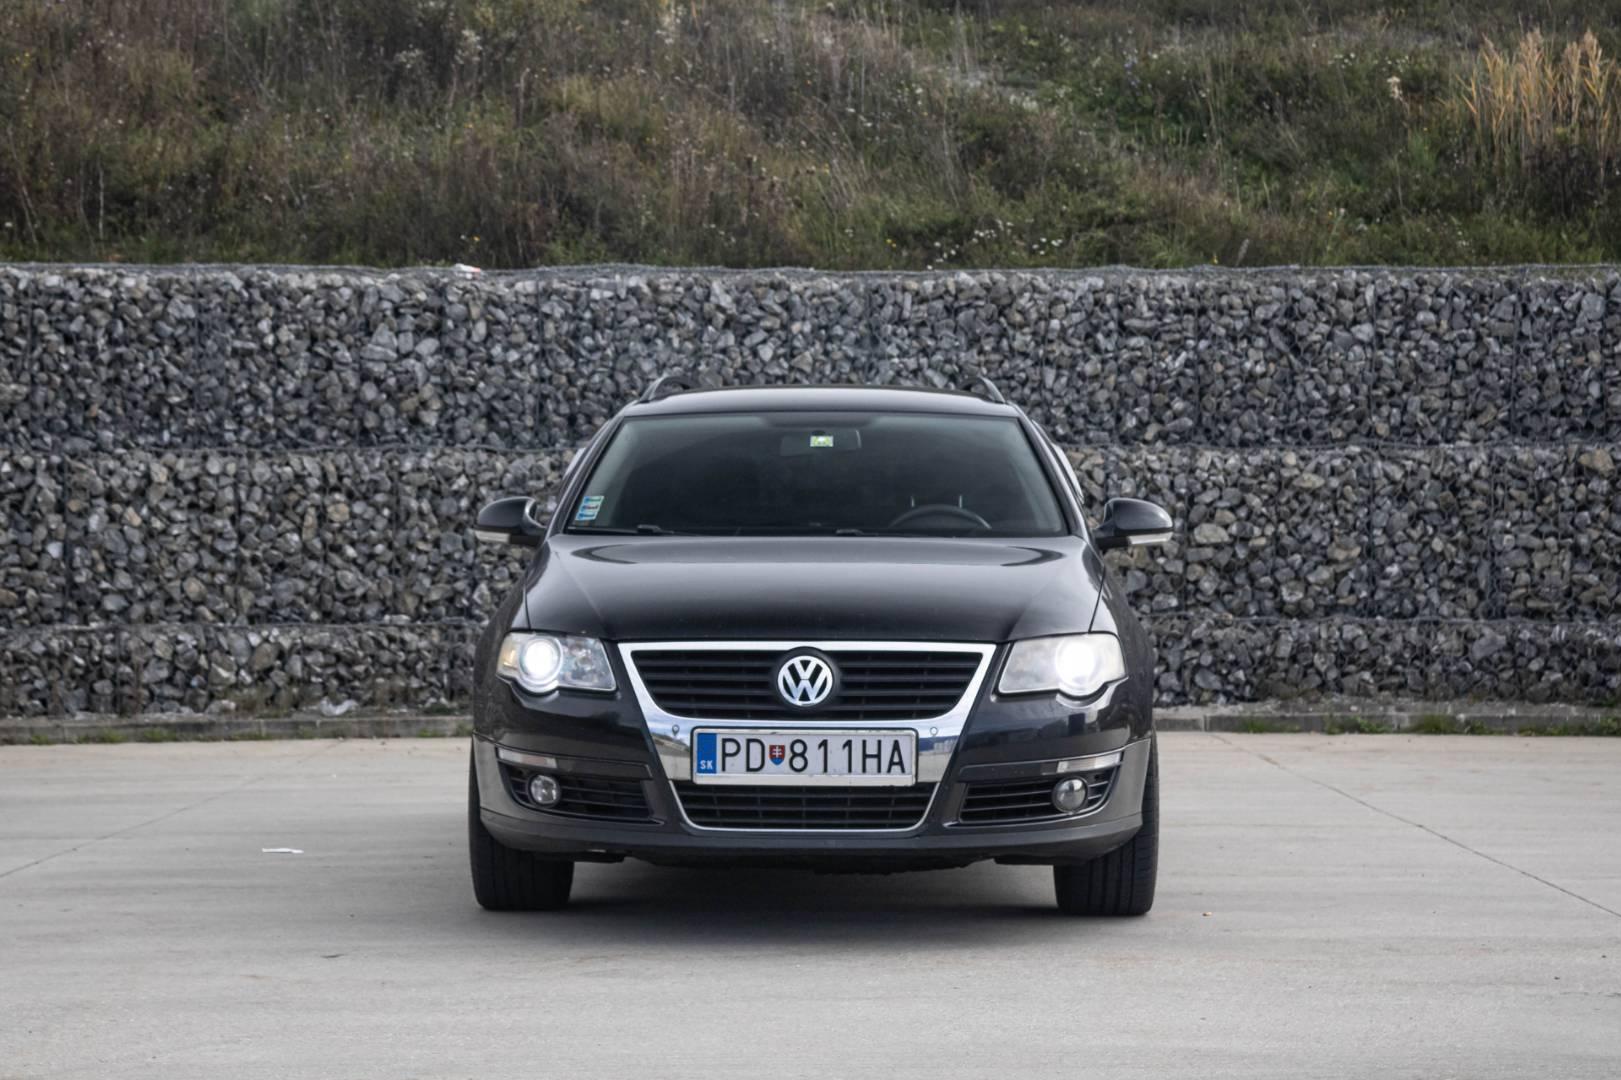 Volkswagen Passat Variant 2.0 TDI Highline DSG